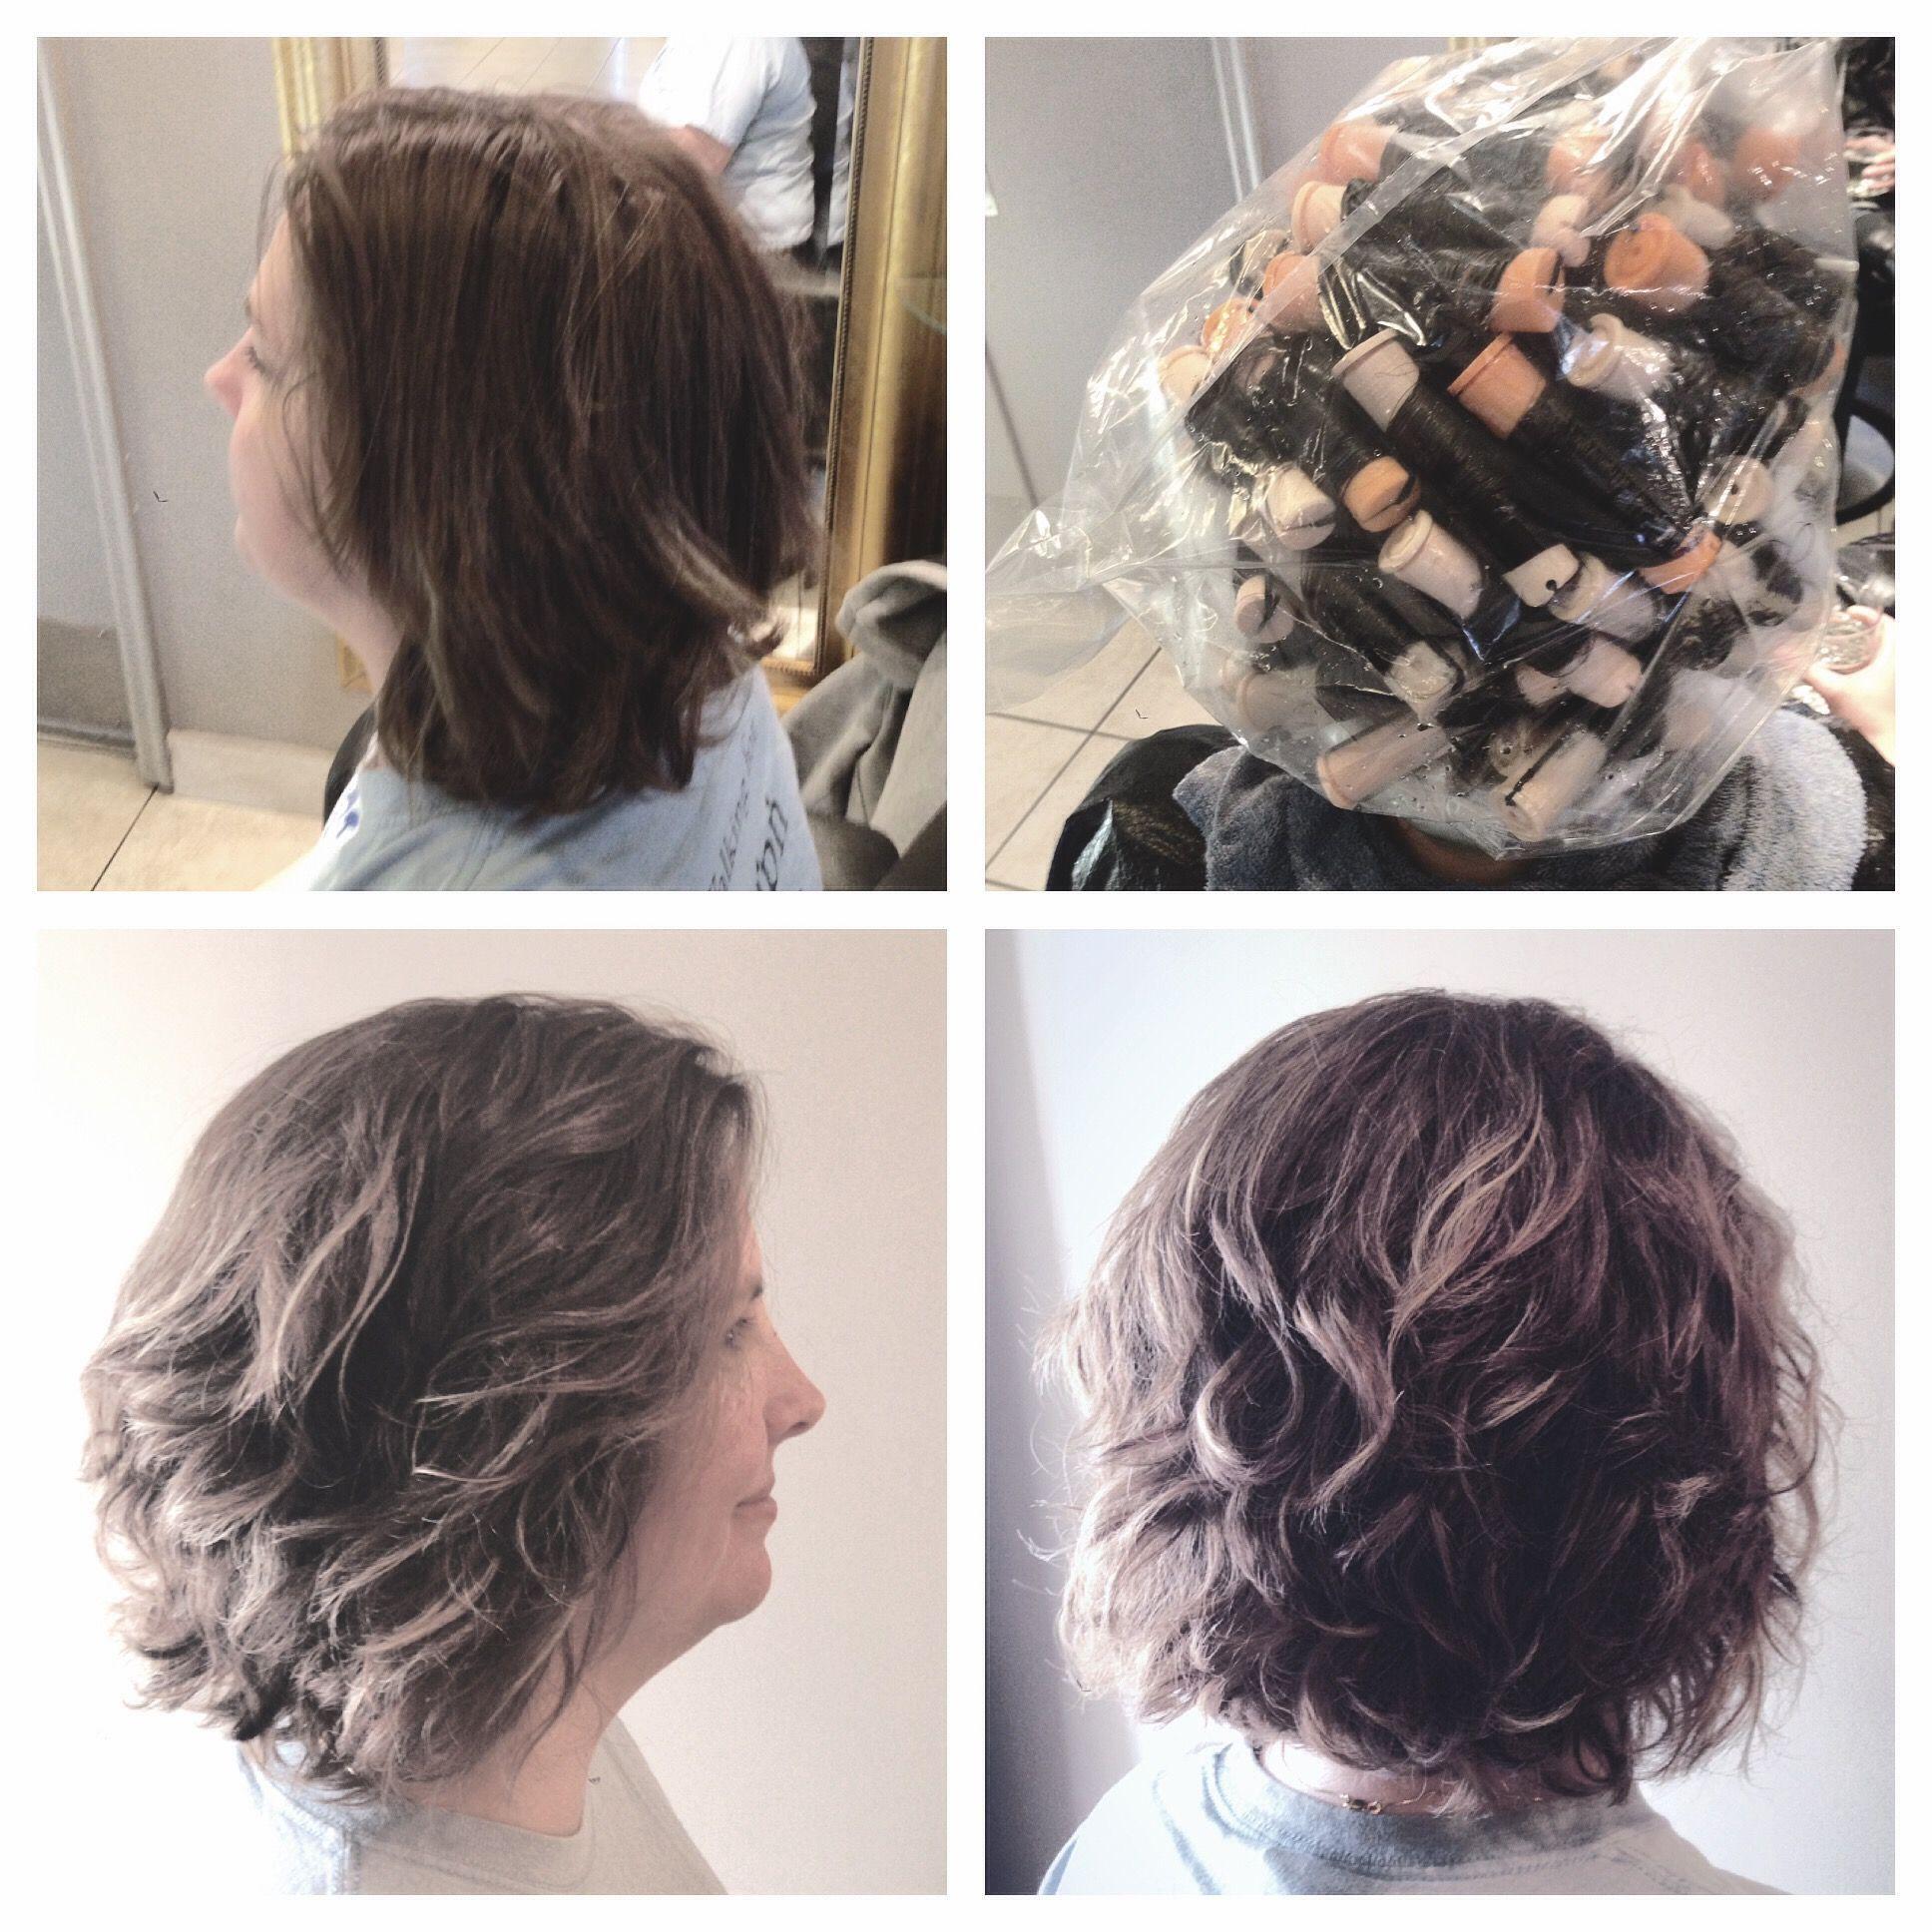 Https I Pinimg Com Originals 9a F5 63 9af563041e659e933c1c52d6b553e07d Jpg In 2020 Short Permed Hair Body Wave Perm Permed Hairstyles